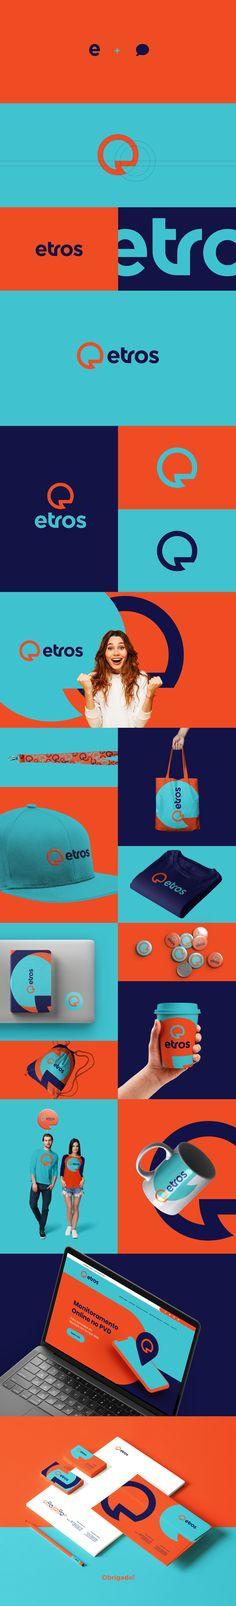 Best Brand Identity Designs Of The Week 12 - Branding design - identity - Graphic Design Inspiration Corporate Design, Corporate Branding, Brand Identity Design, Graphic Design Branding, Logo Branding, Brochure Design, Design Logos, Design Logo Inspiration, Design Corporativo